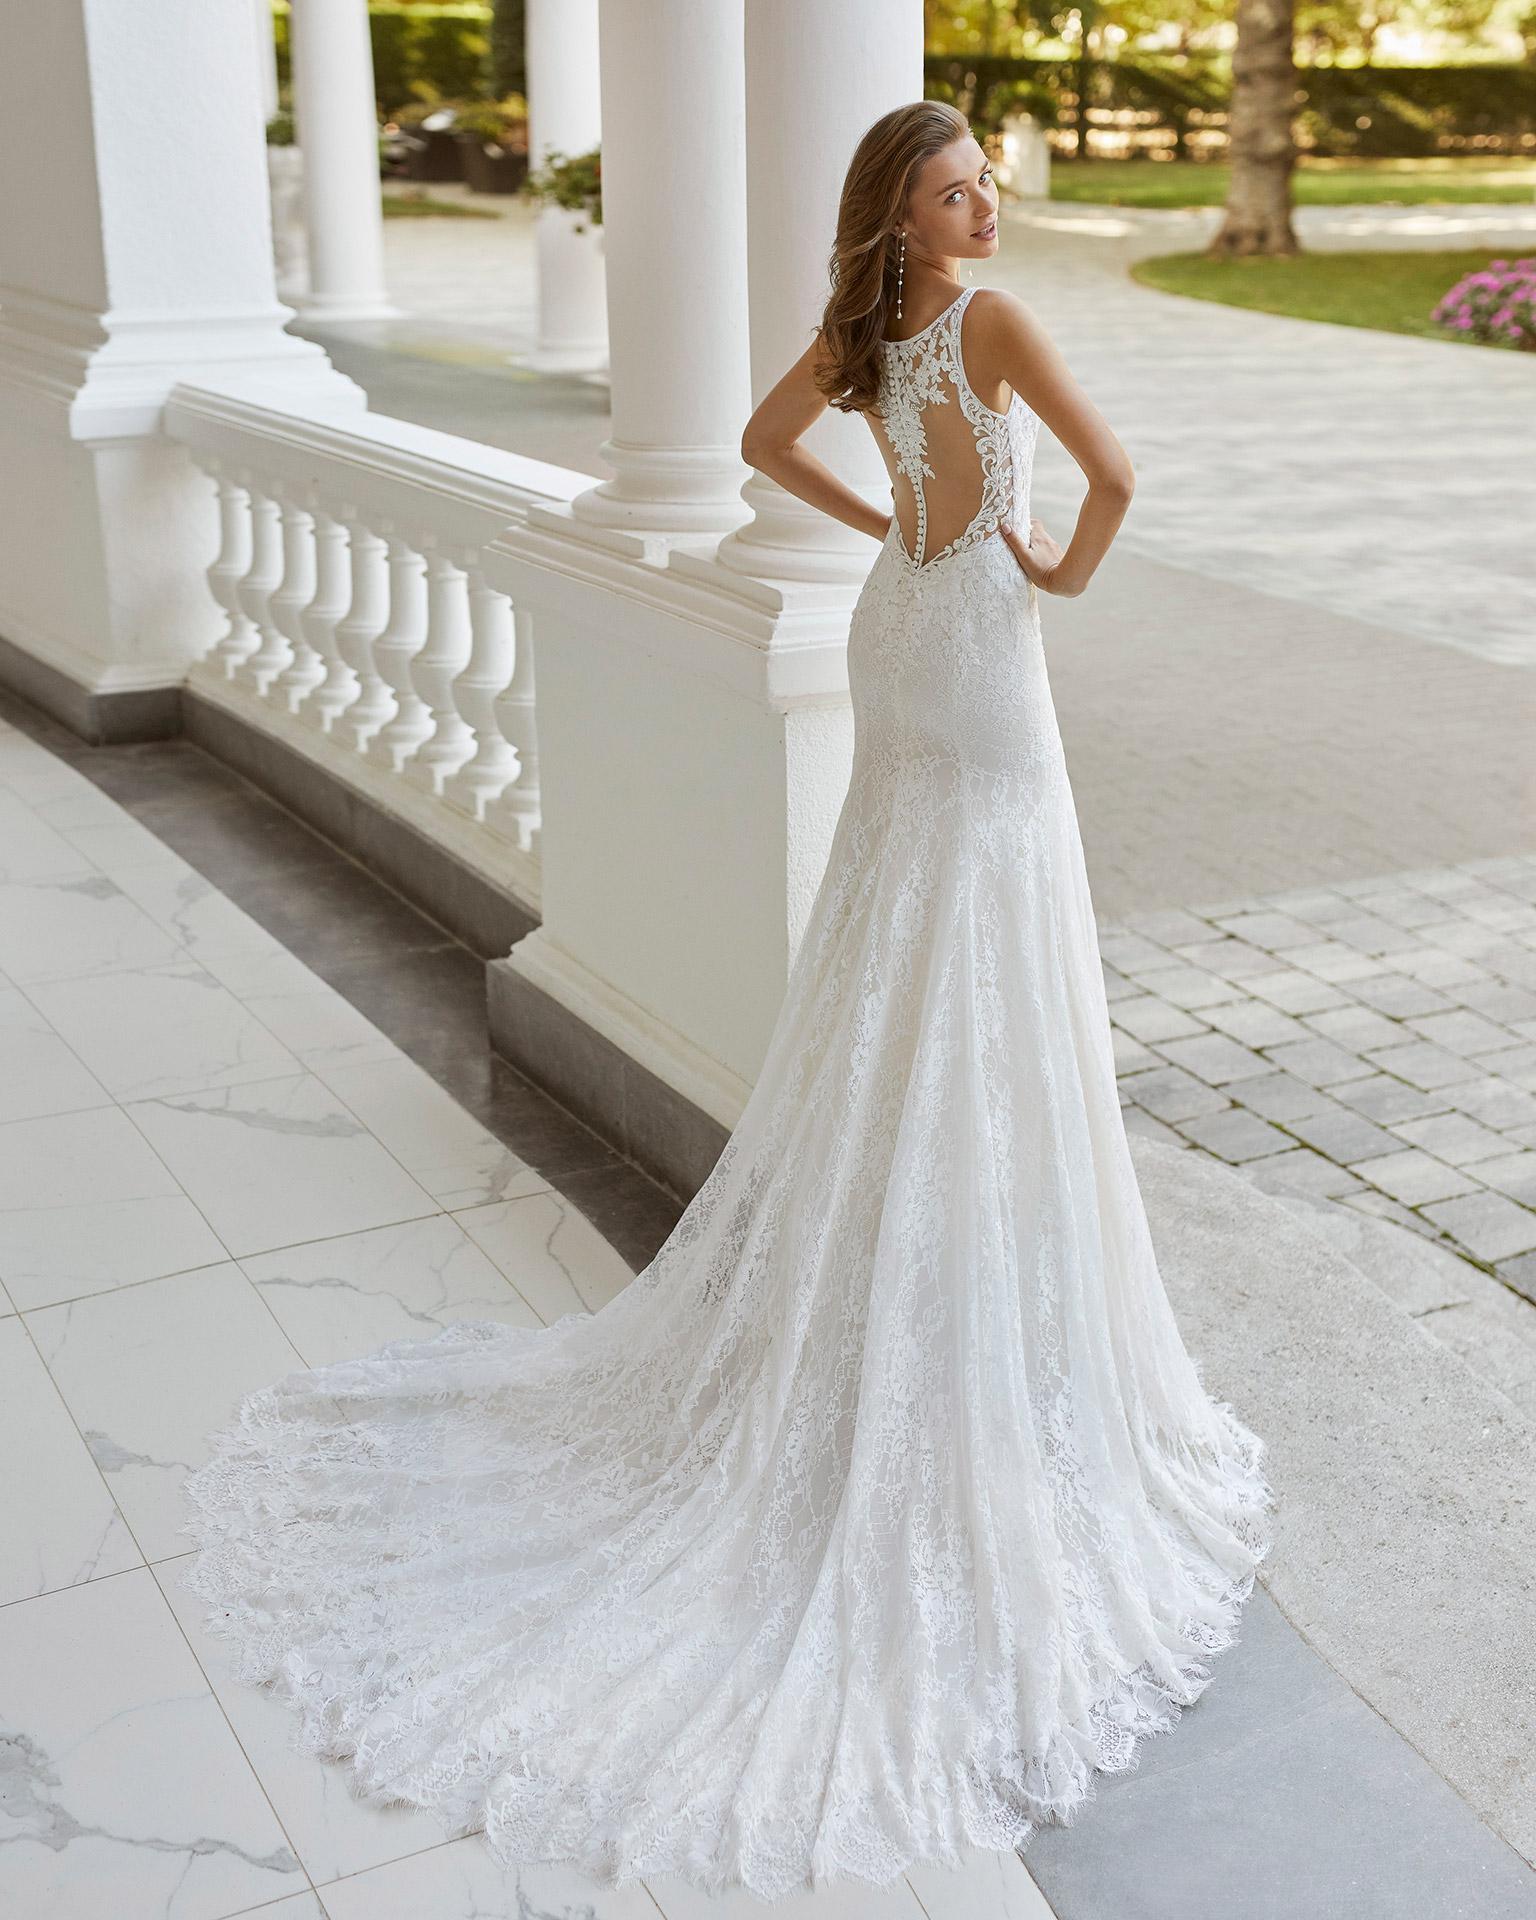 Adriana Alier modelo Saona colección 2022 rosa clará essencia novias